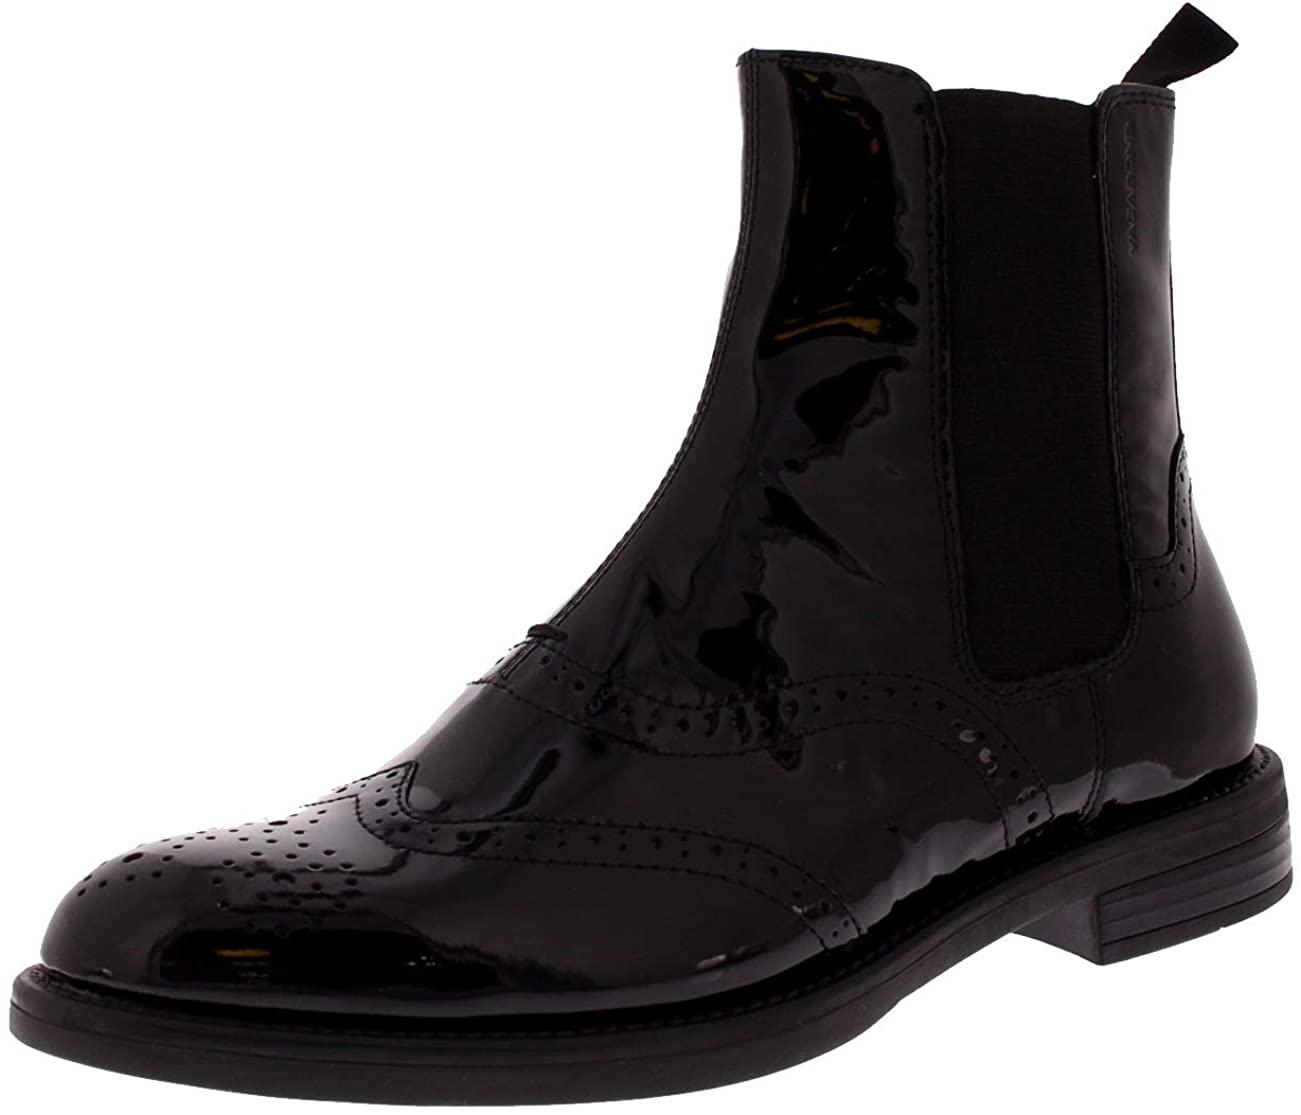 Vagabond Womens Amina Office Work Block Heel Patent Leather Ankle Boot - Black